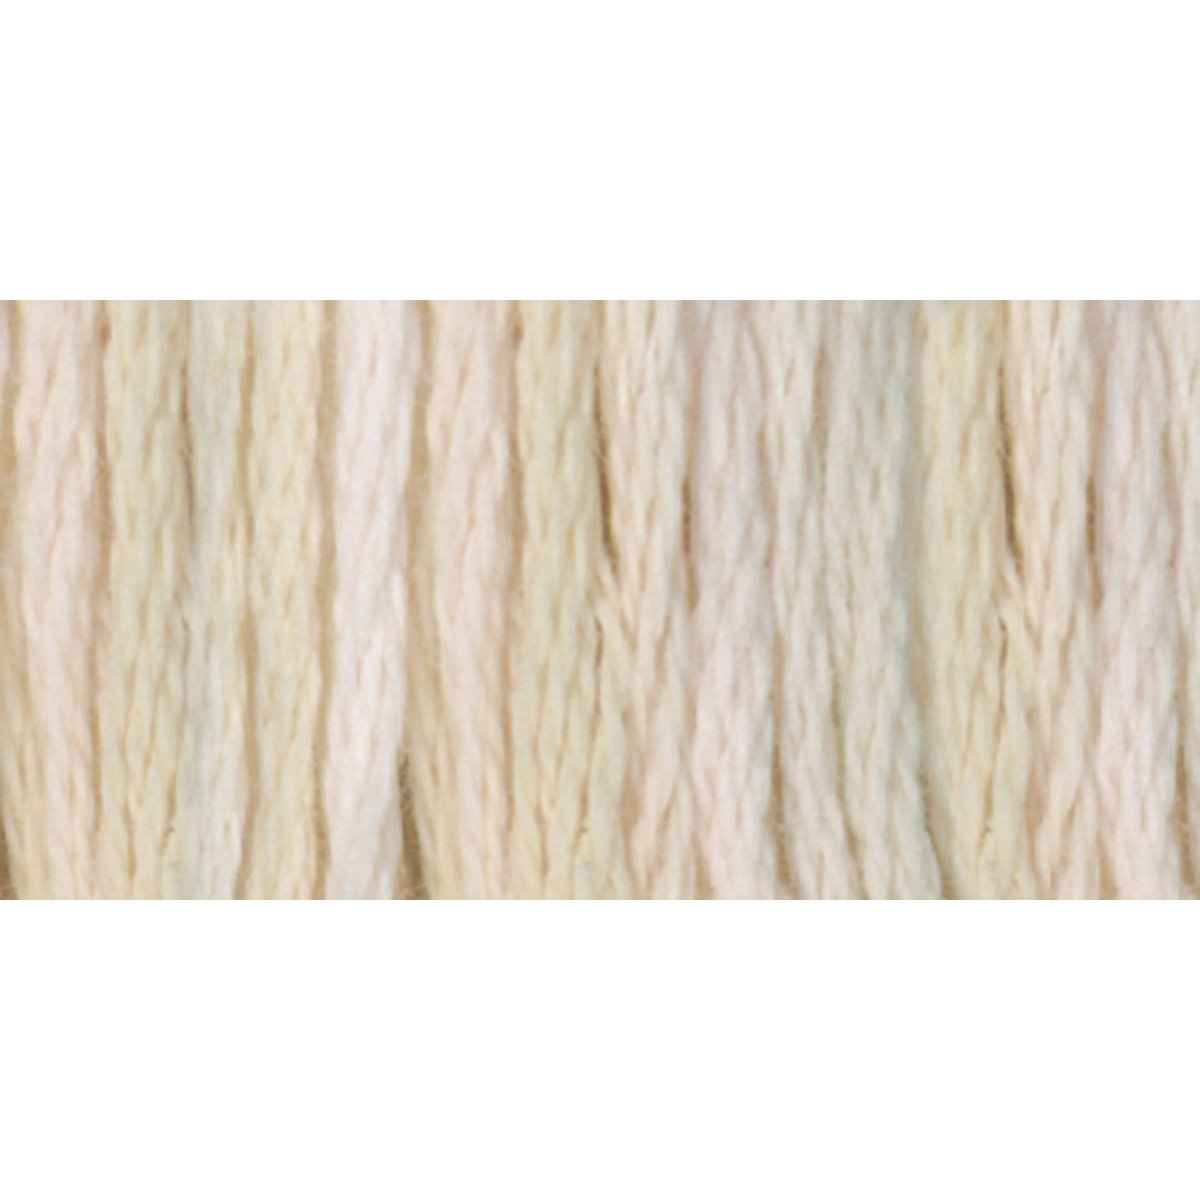 DMC 417F-4150 Color Variations Six Strand Embroidery Floss, 8.7-Yard, Desert Sand